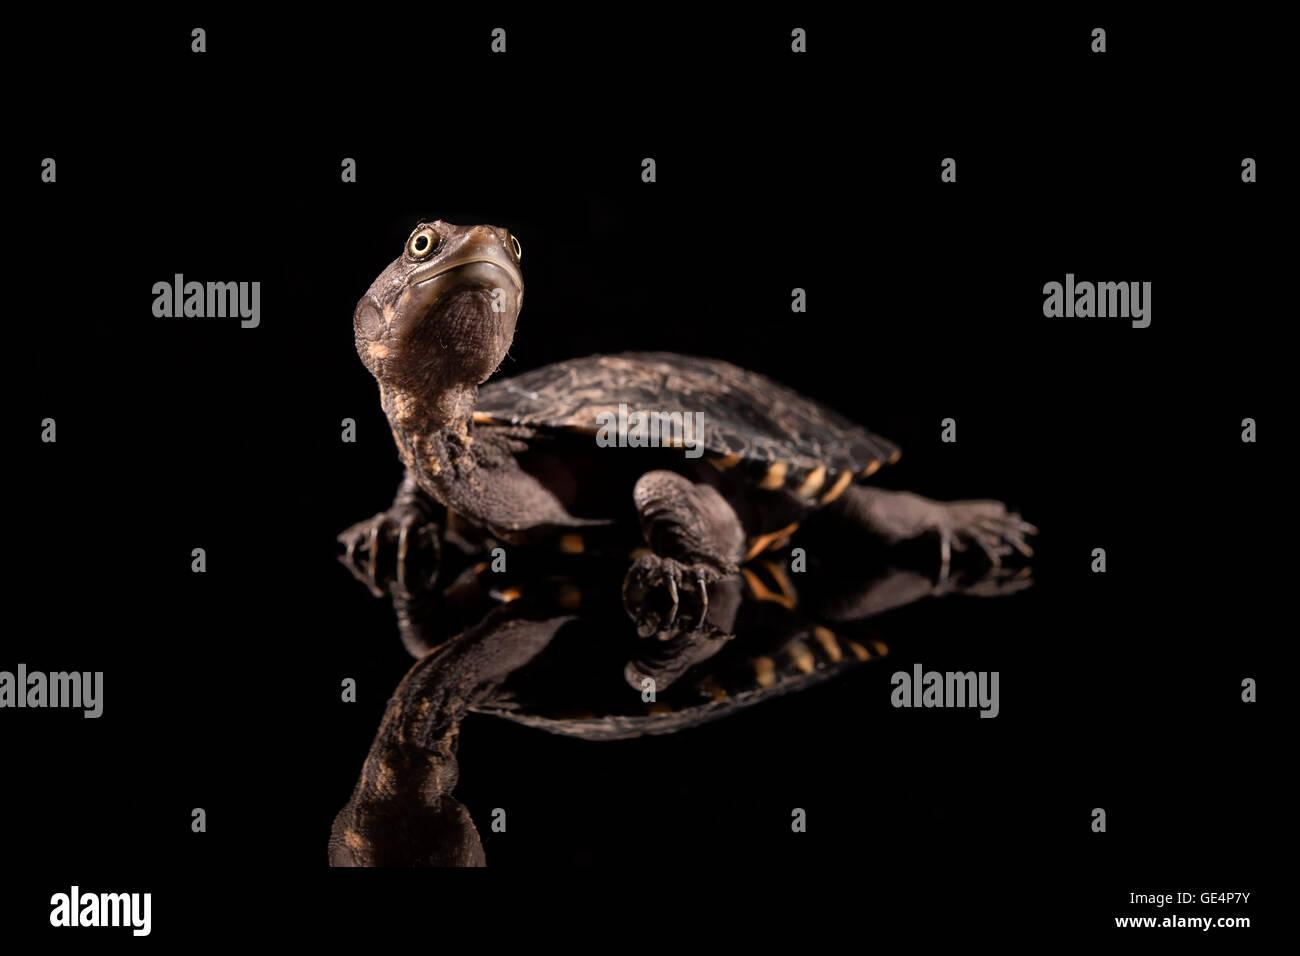 Baby Eastern Long-Necked Turtle looking upwards Stock Photo